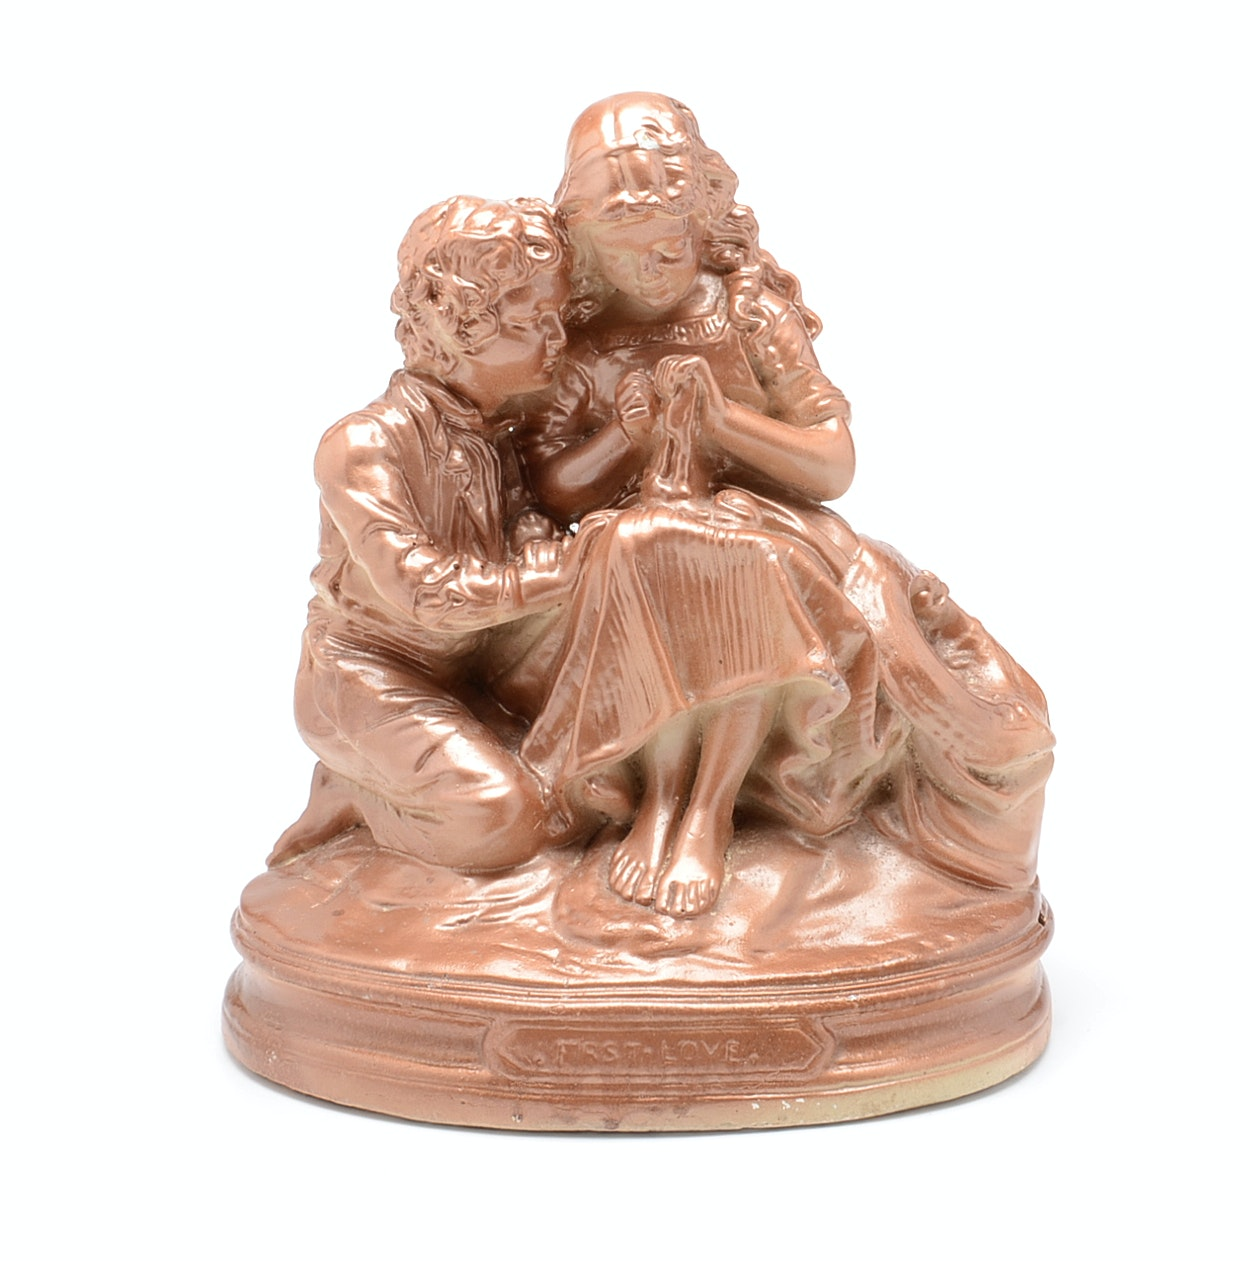 Chalk-ware John Rogers Reproduction Figurine